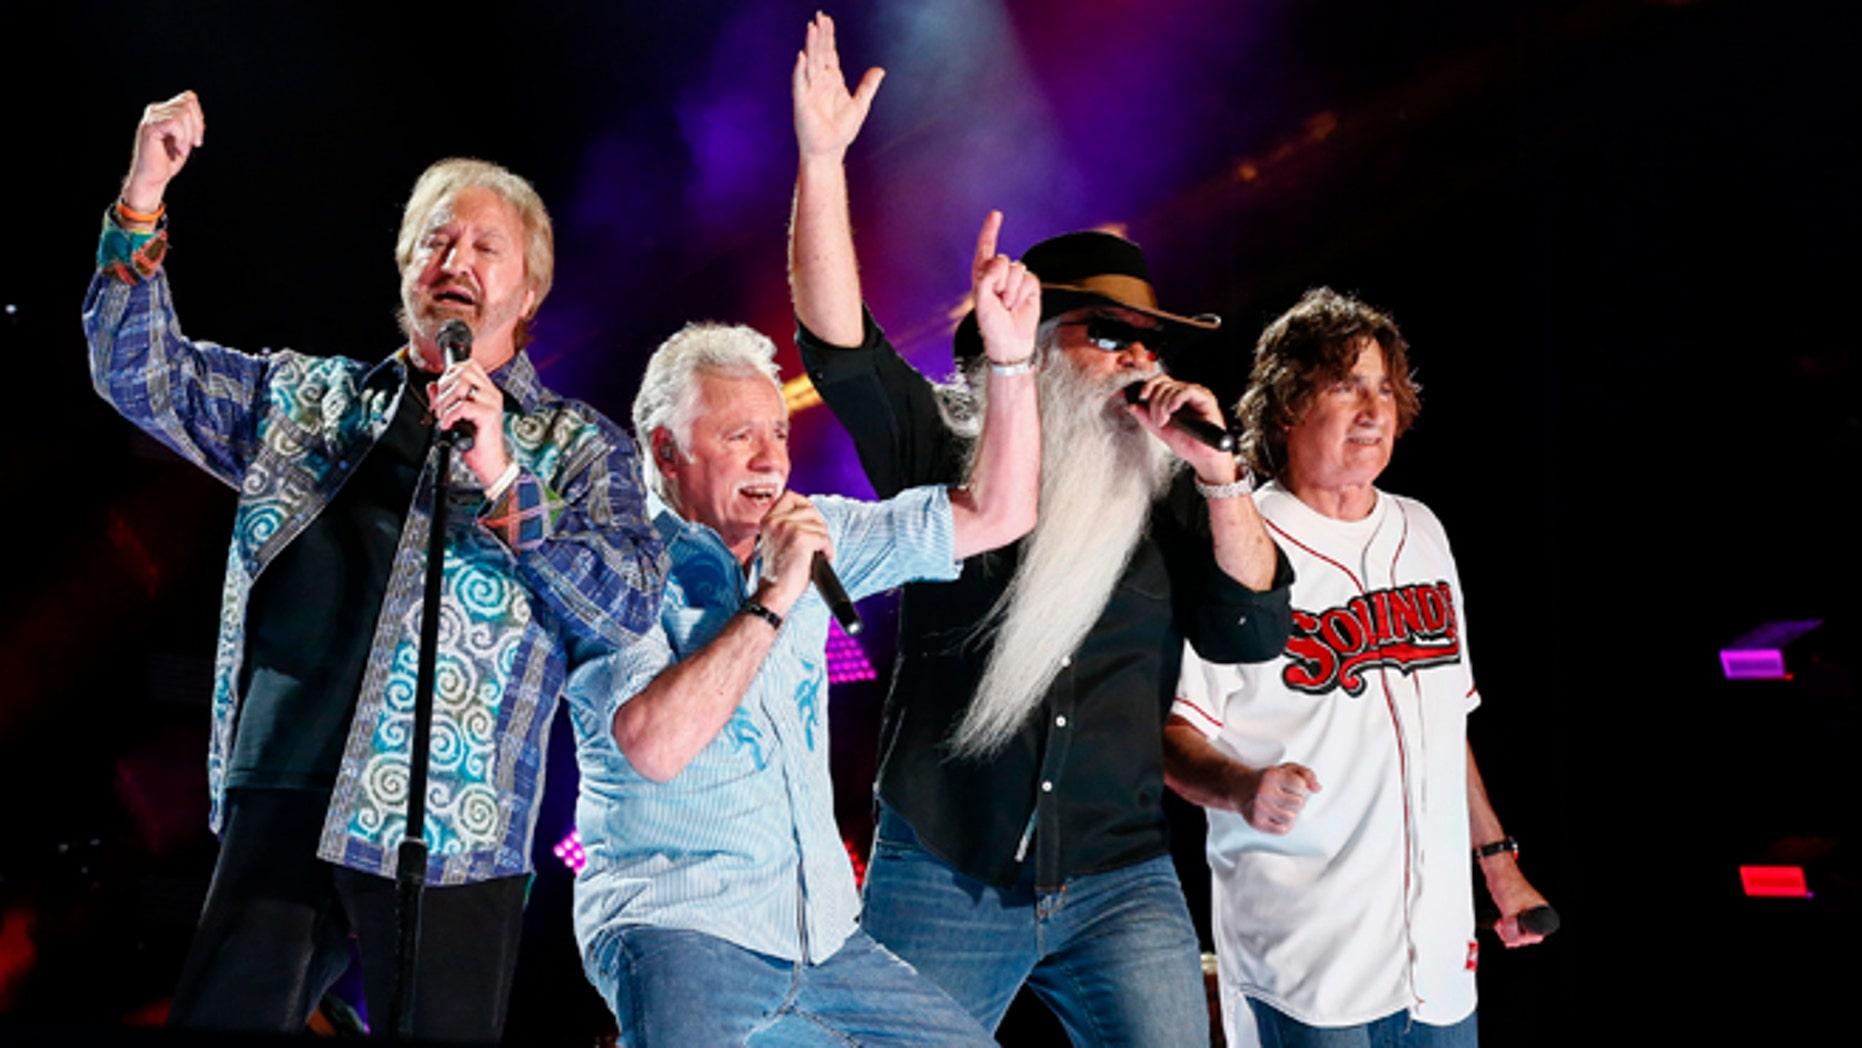 June 12, 2015. Duane Allen, from left, Joe Bonsall, William Lee Golden, and Richard Sterban of The Oak Ridge Boys perform at LP Field at the CMA Music Festival in Nashville, Tenn.